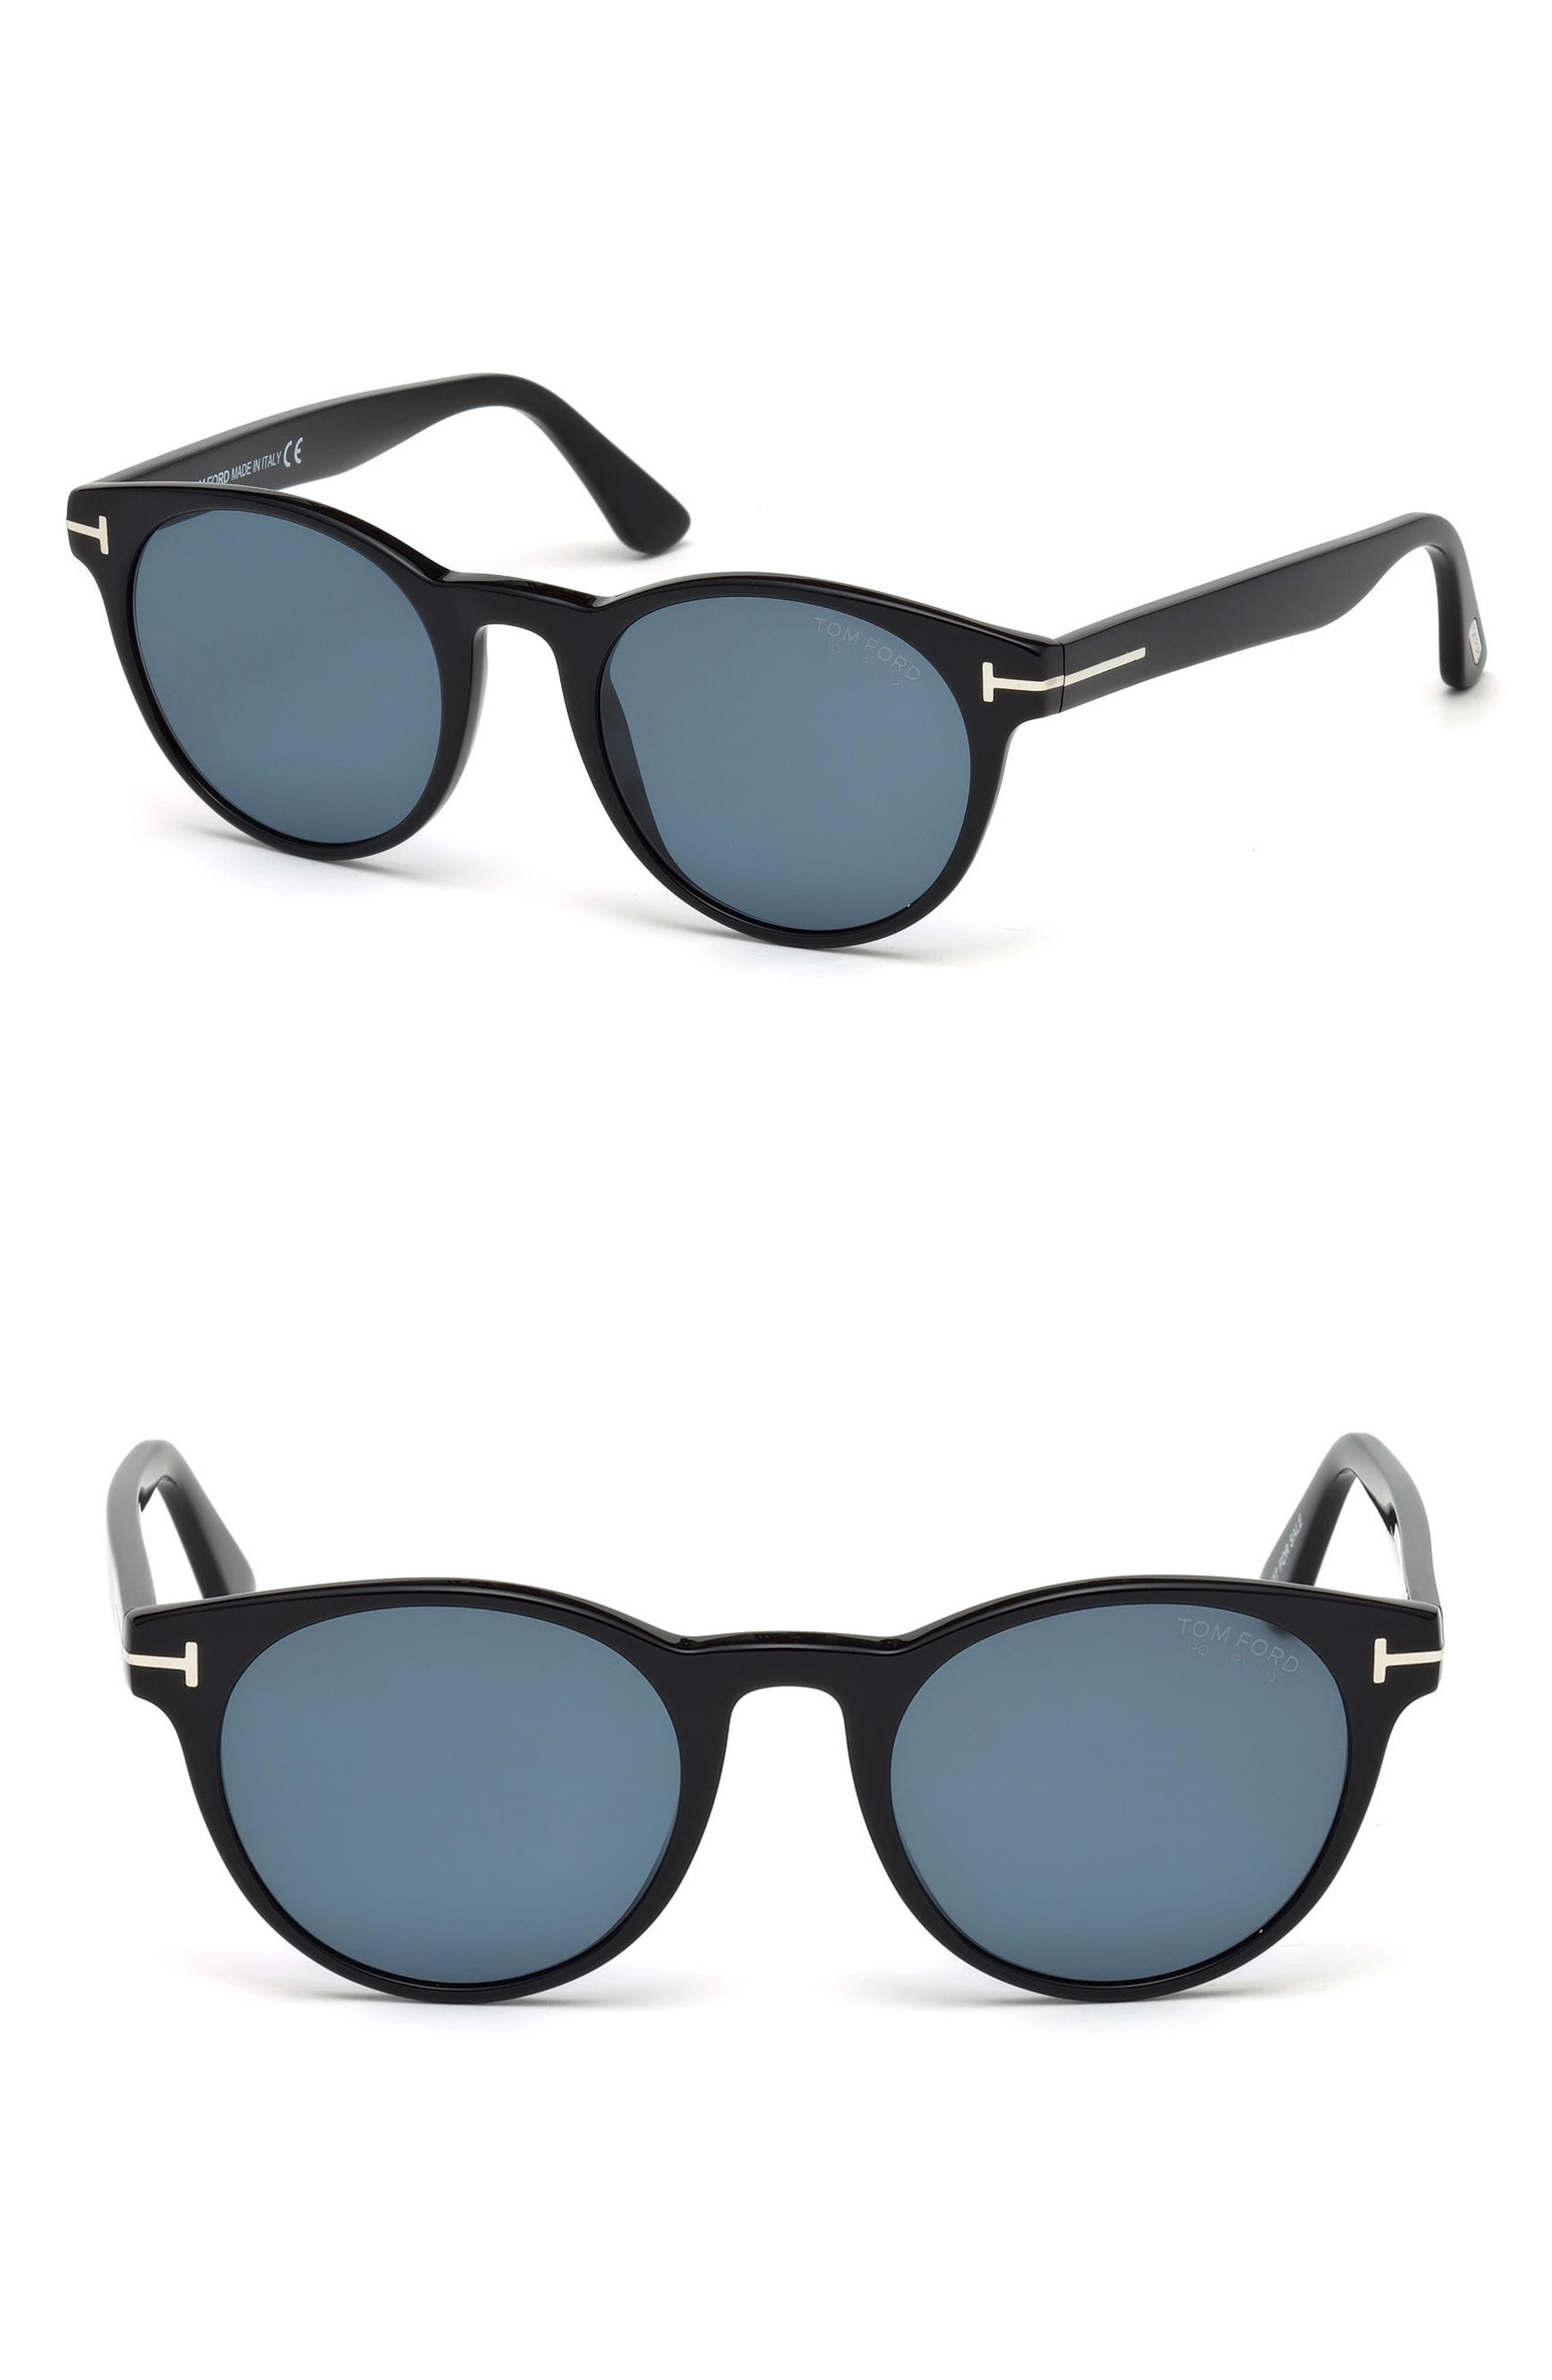 Main Image - Tom Ford Palmer 51mm Polarized Sunglasses